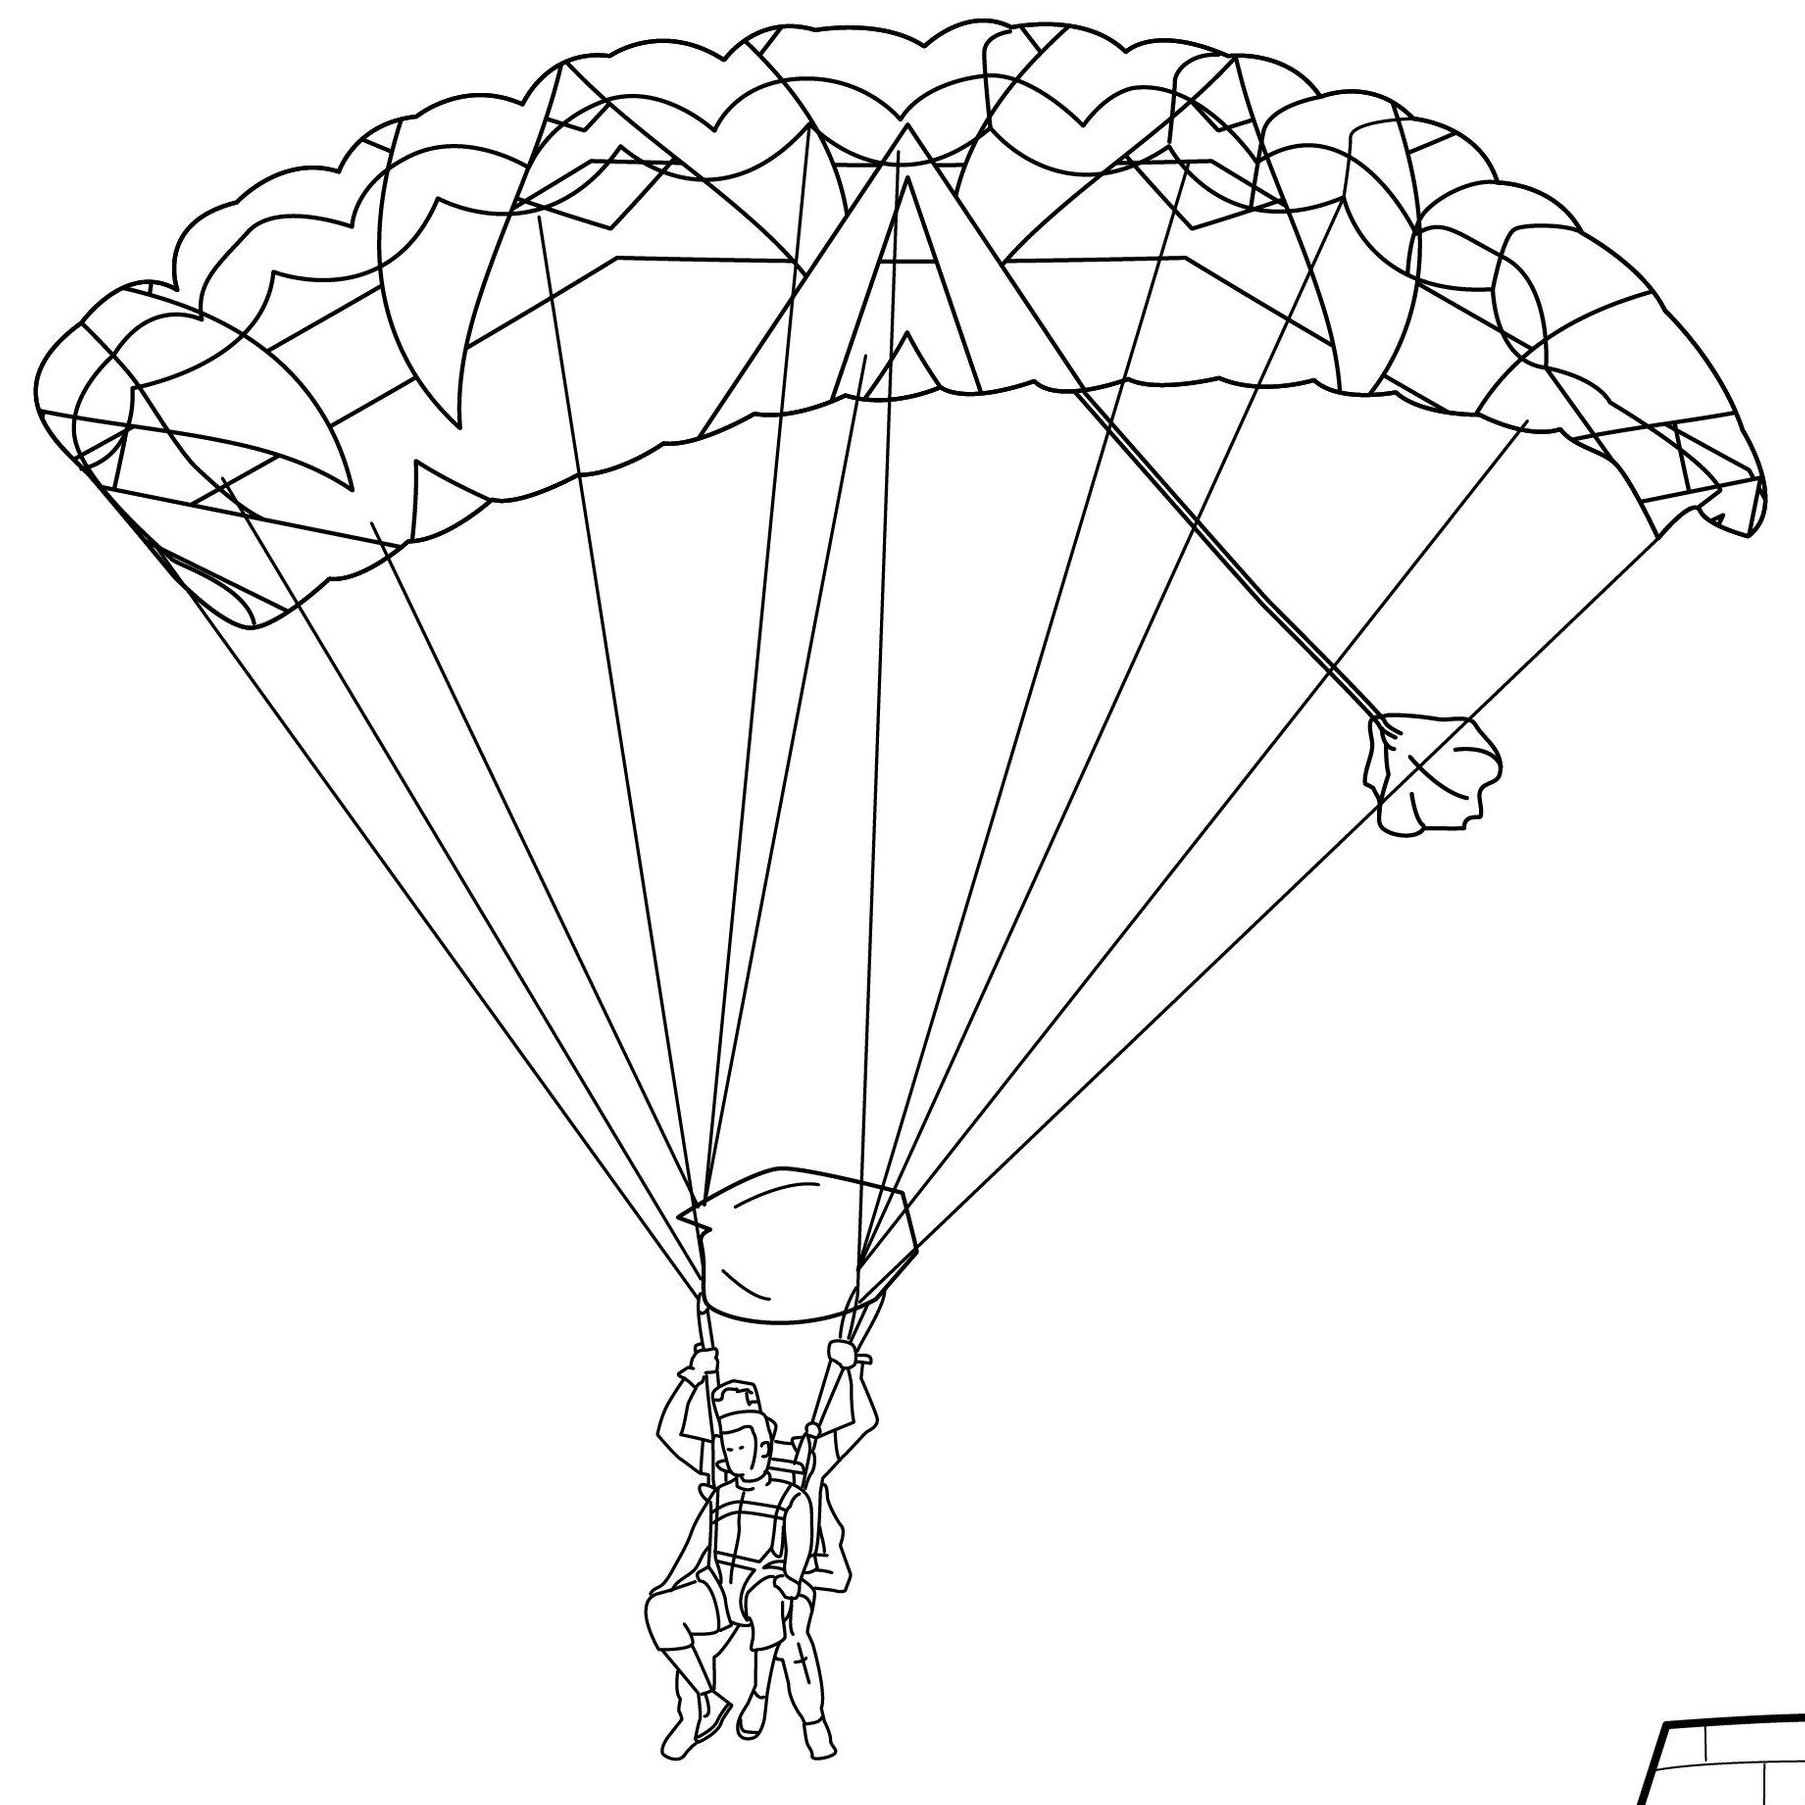 10 - Skydive DeLand-01.jpg